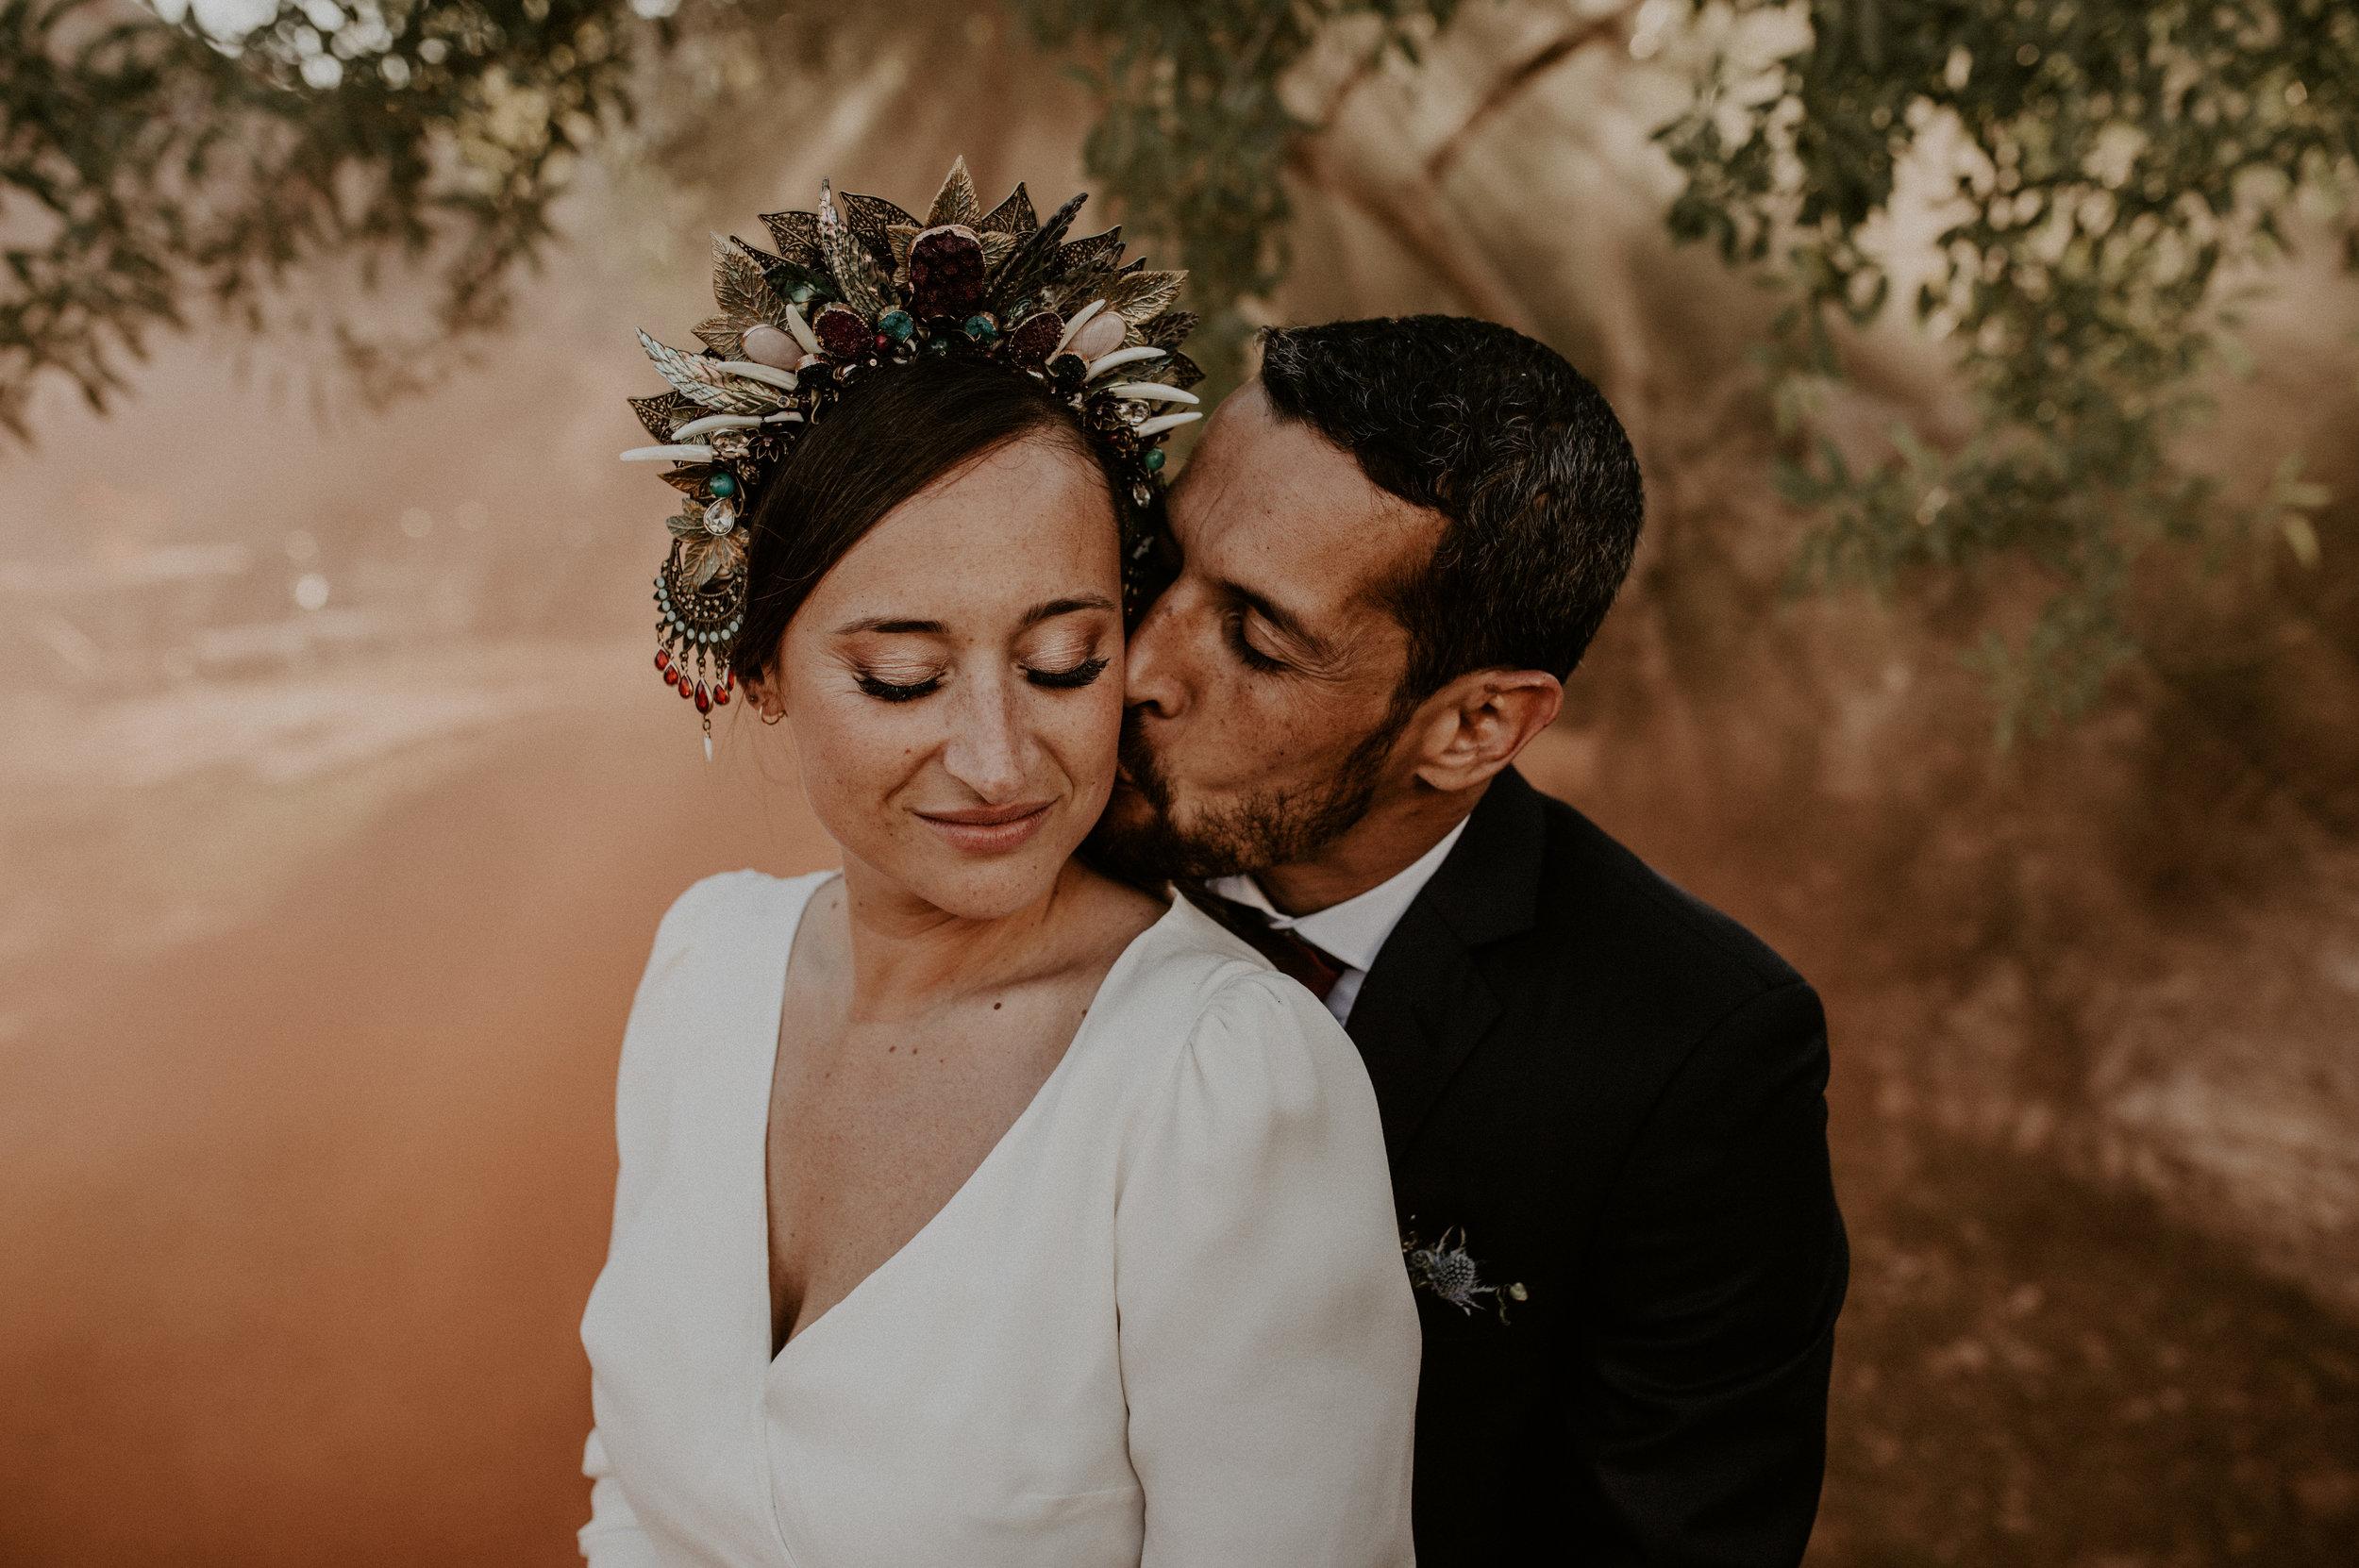 thenortherngirlphotography-fotografa-de-bodas-barcelona_destinartion-wedding-photographer_wedding-photographer_moroccan-wedding_HADNANANTIGONA-749.jpg